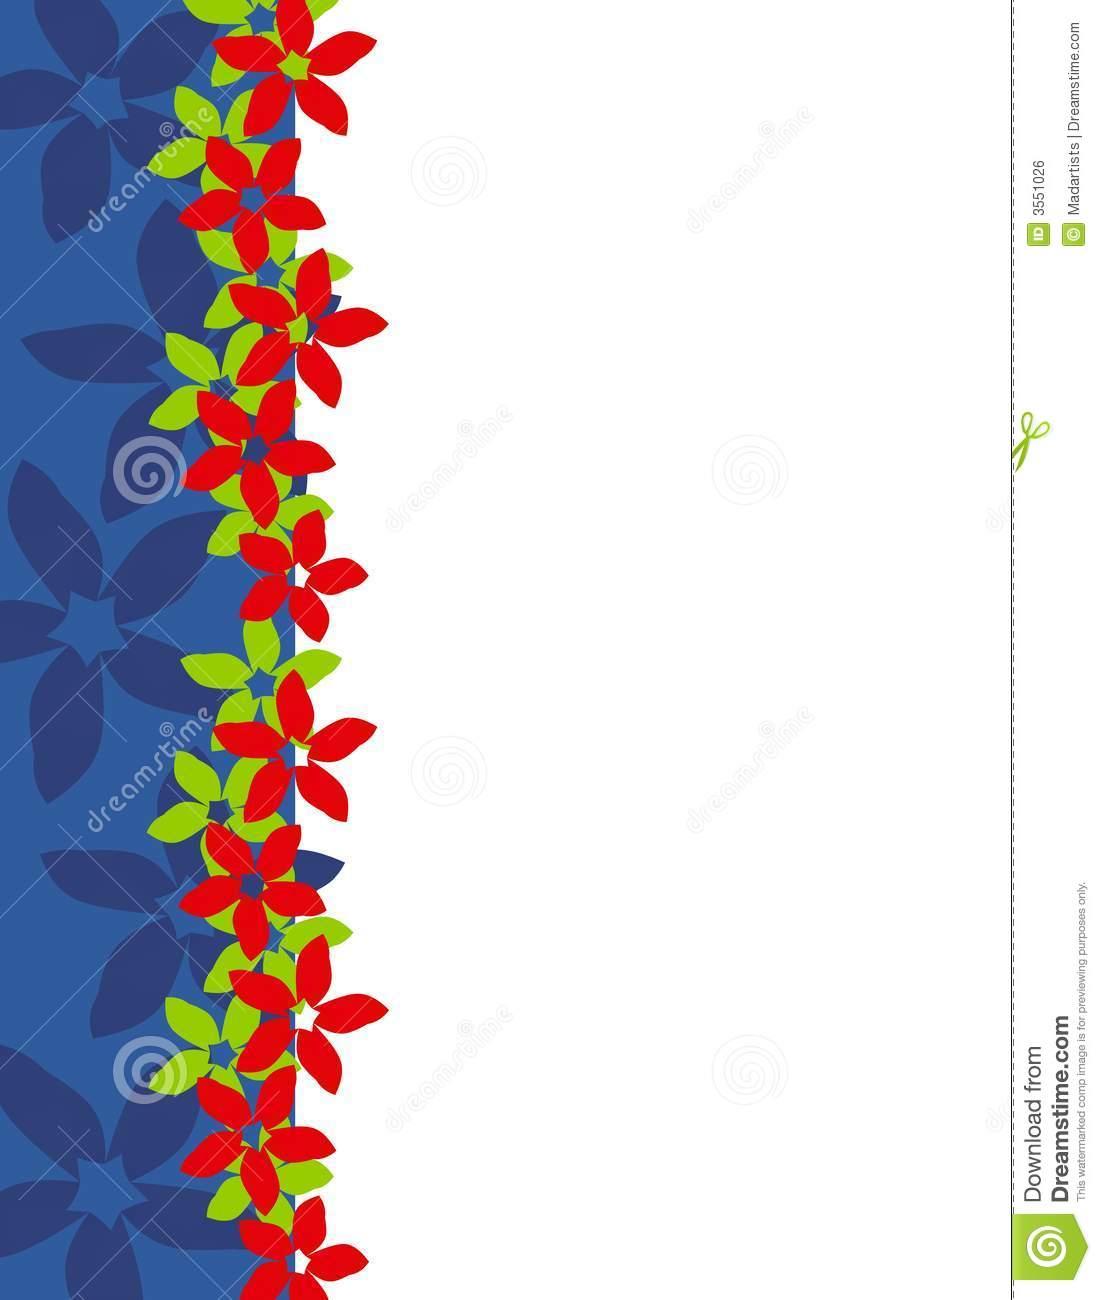 blue-flower-border-clip-art-xmas-poinsettia-page-border-2-3551026.jpg